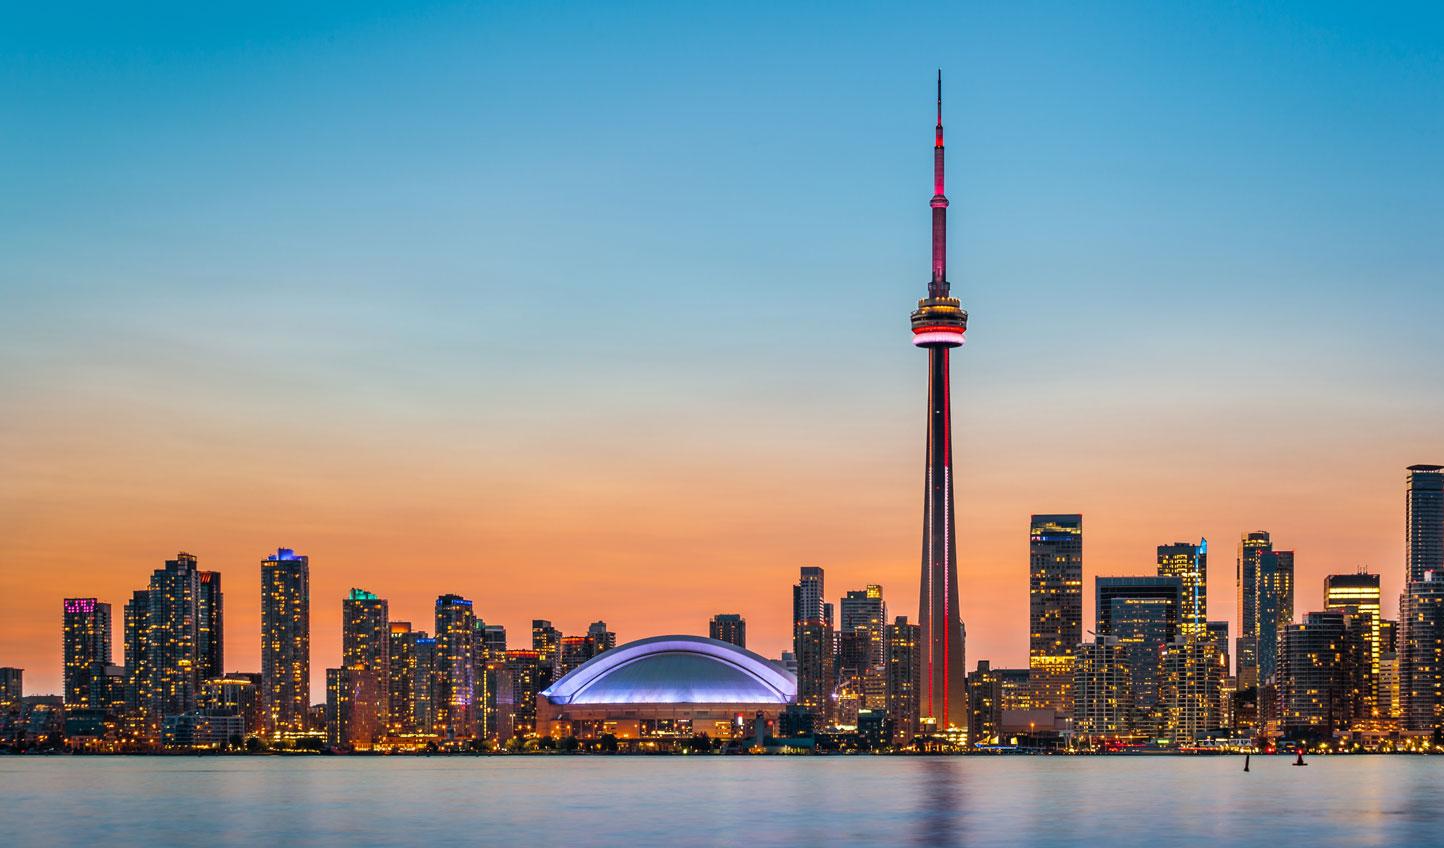 Witness the majesty of Toronto's skyline at night